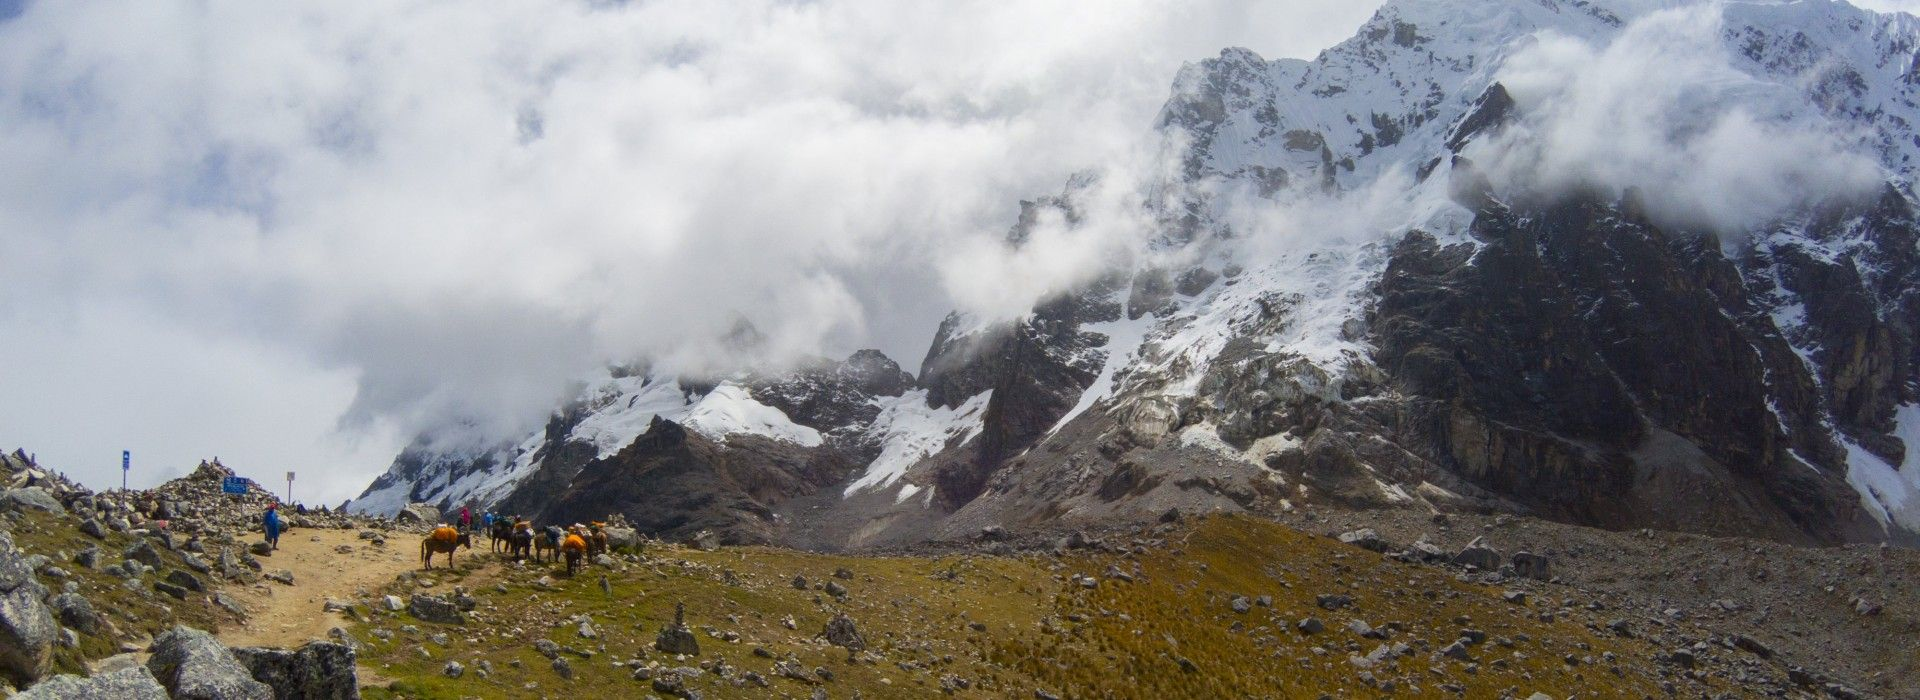 Trekking Tours in Peru